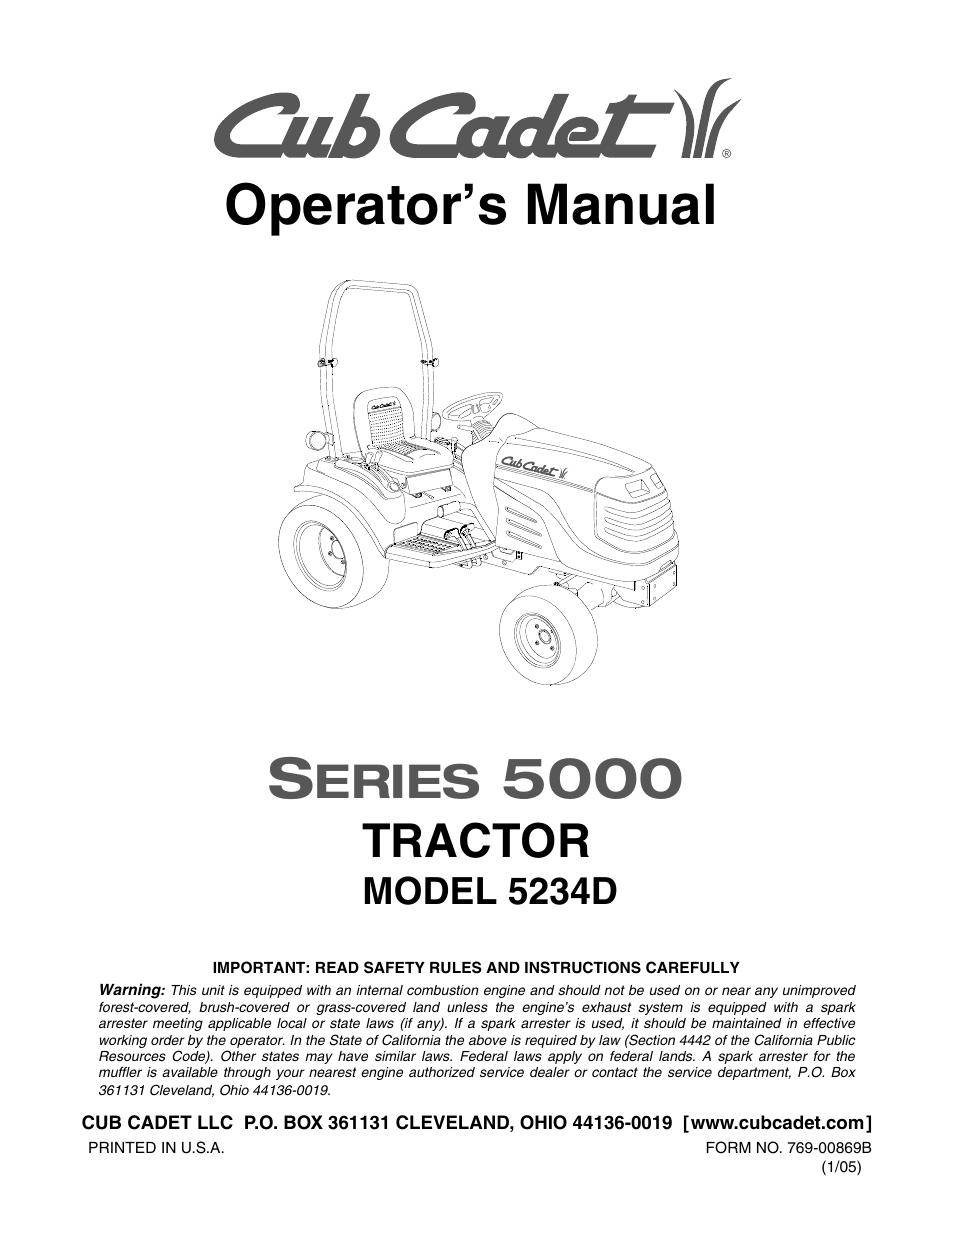 cub cadet 5234 user manual 48 pages rh manualsdir com Cub Cadet 5234D Transmission Cub Cadet Loader